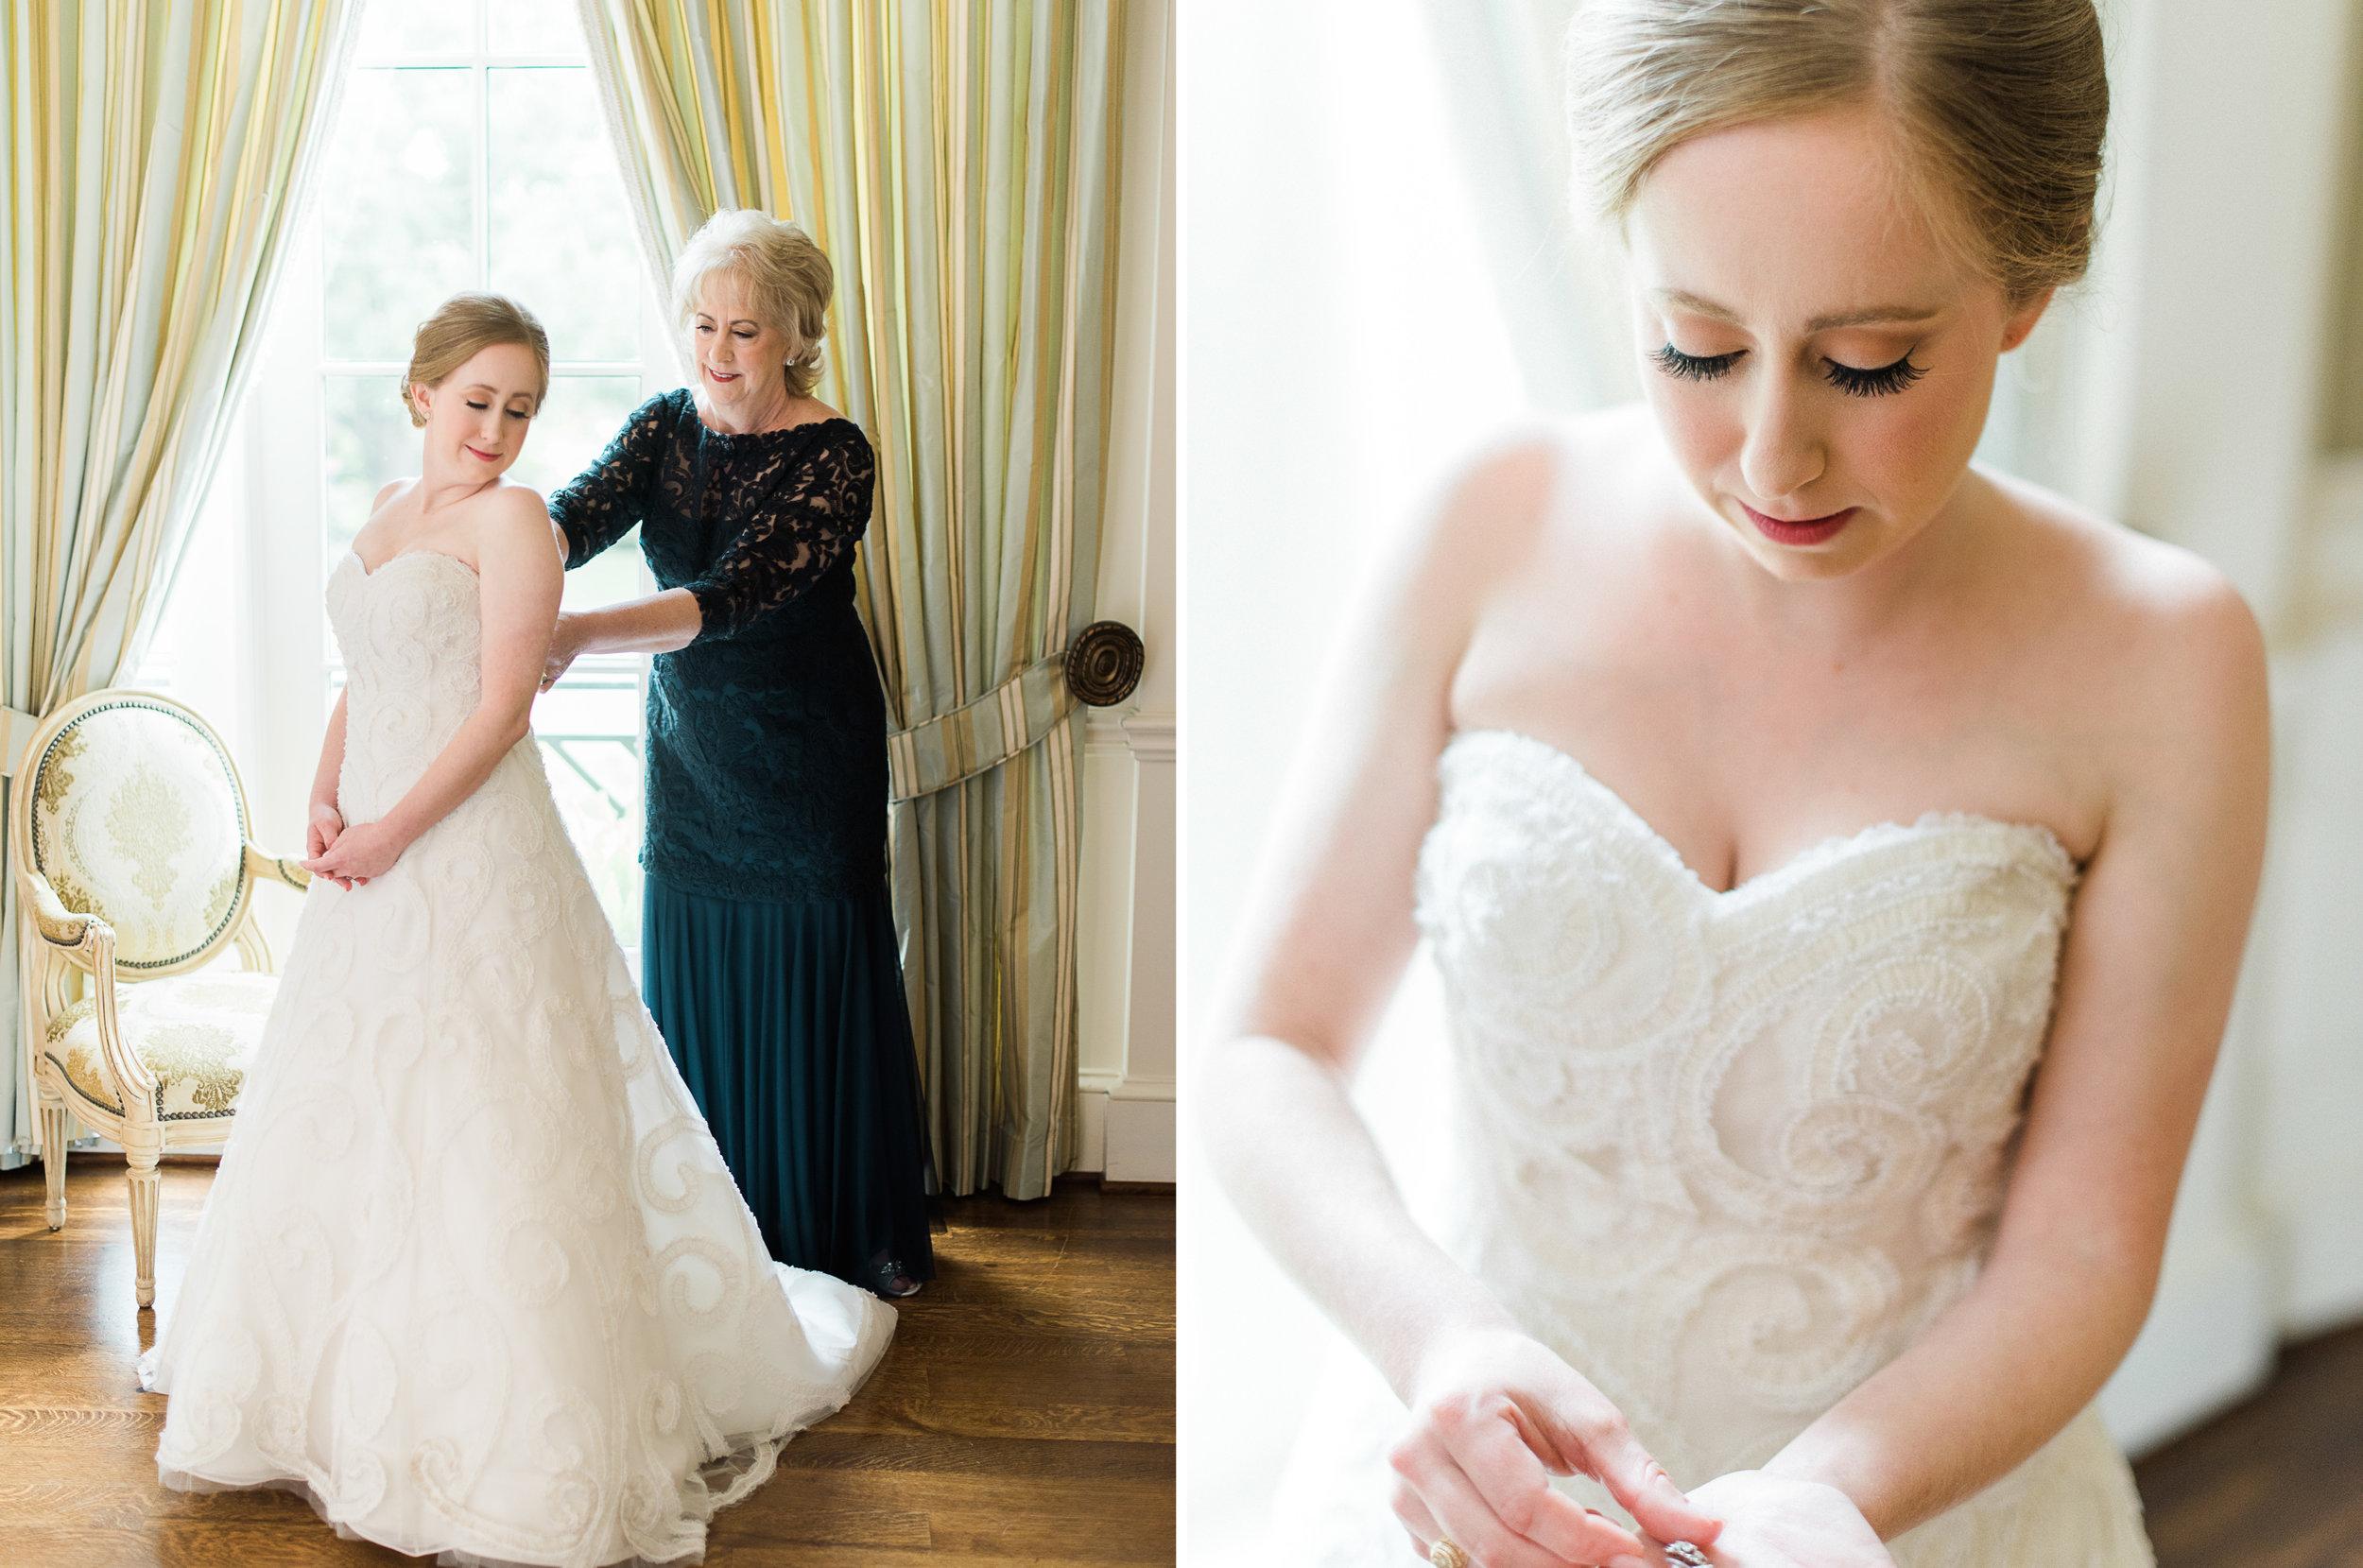 Fine-Art-Film-Houston-Wedding-Photographer-Best-Top-Luxury-Texas-Austin-Dallas-Destination-Dana-Fernandez-Photography-River-Oaks-Country-Club-South-Main-Baptist-Ceremony-Reception-Wedding-101.jpg